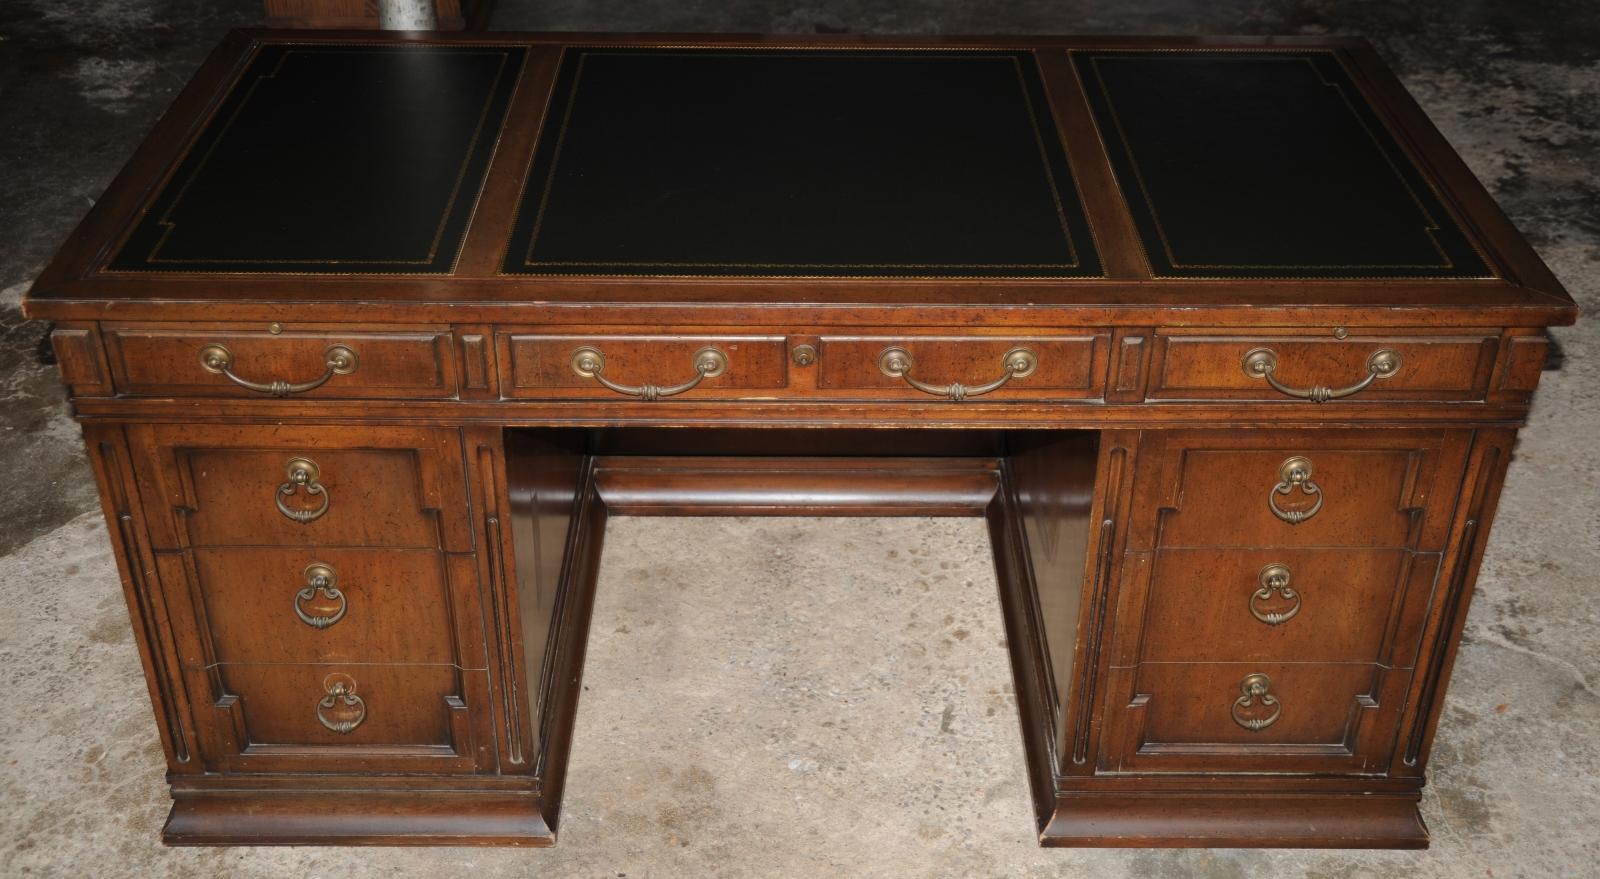 Rhino s Relics SOLD Vintage Sligh Executive Desk